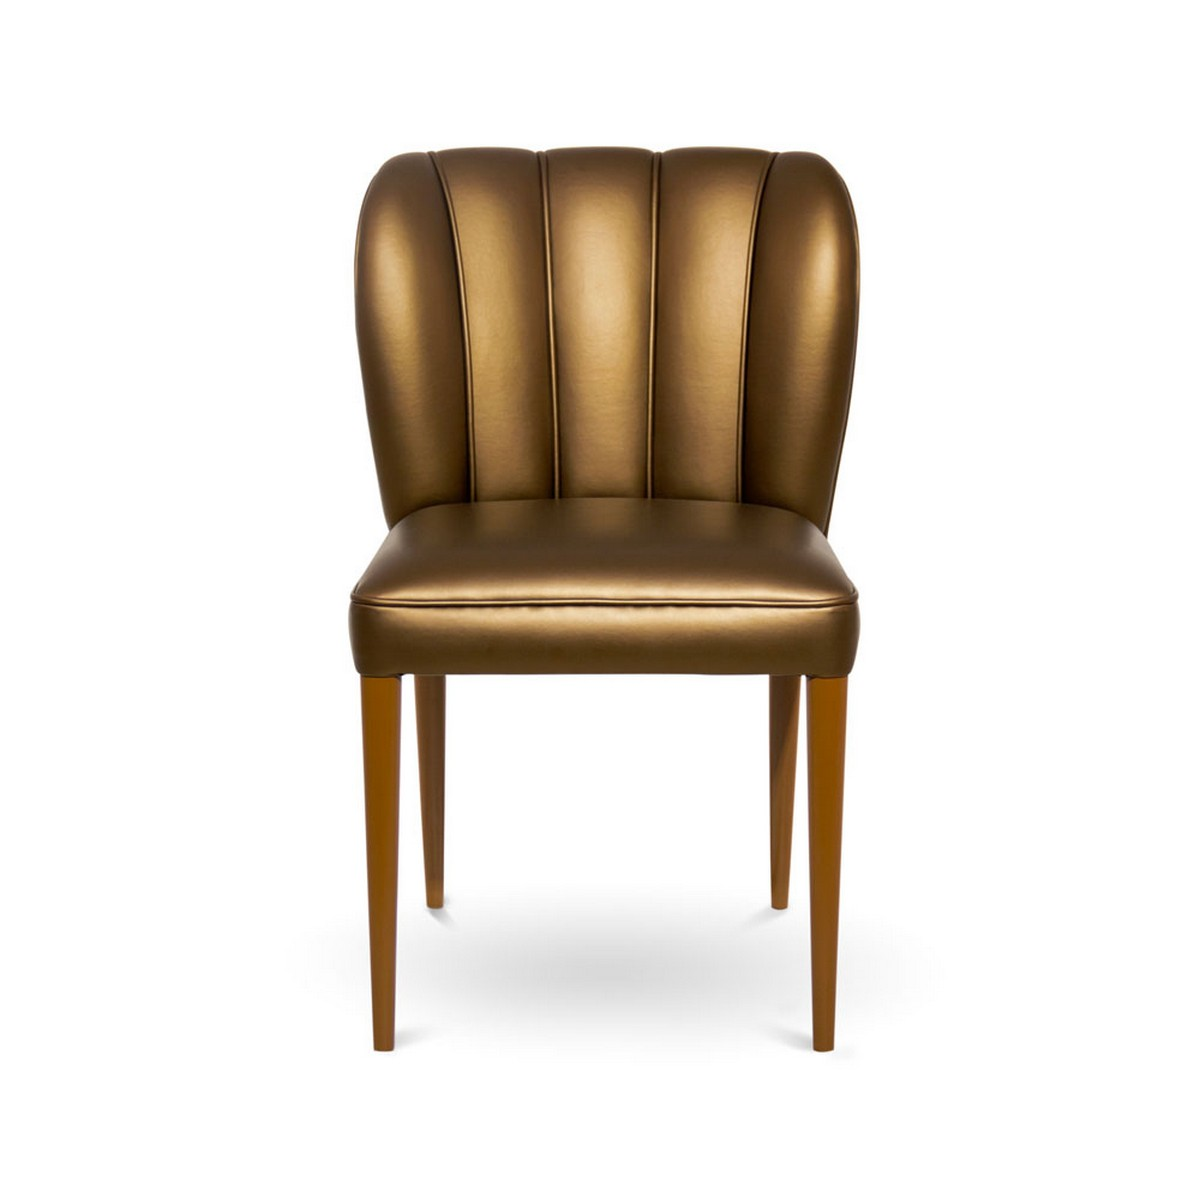 Top Minimalist Dining Chairs minimalist dining chairs Top Minimalist Dining Chairs dalyan2